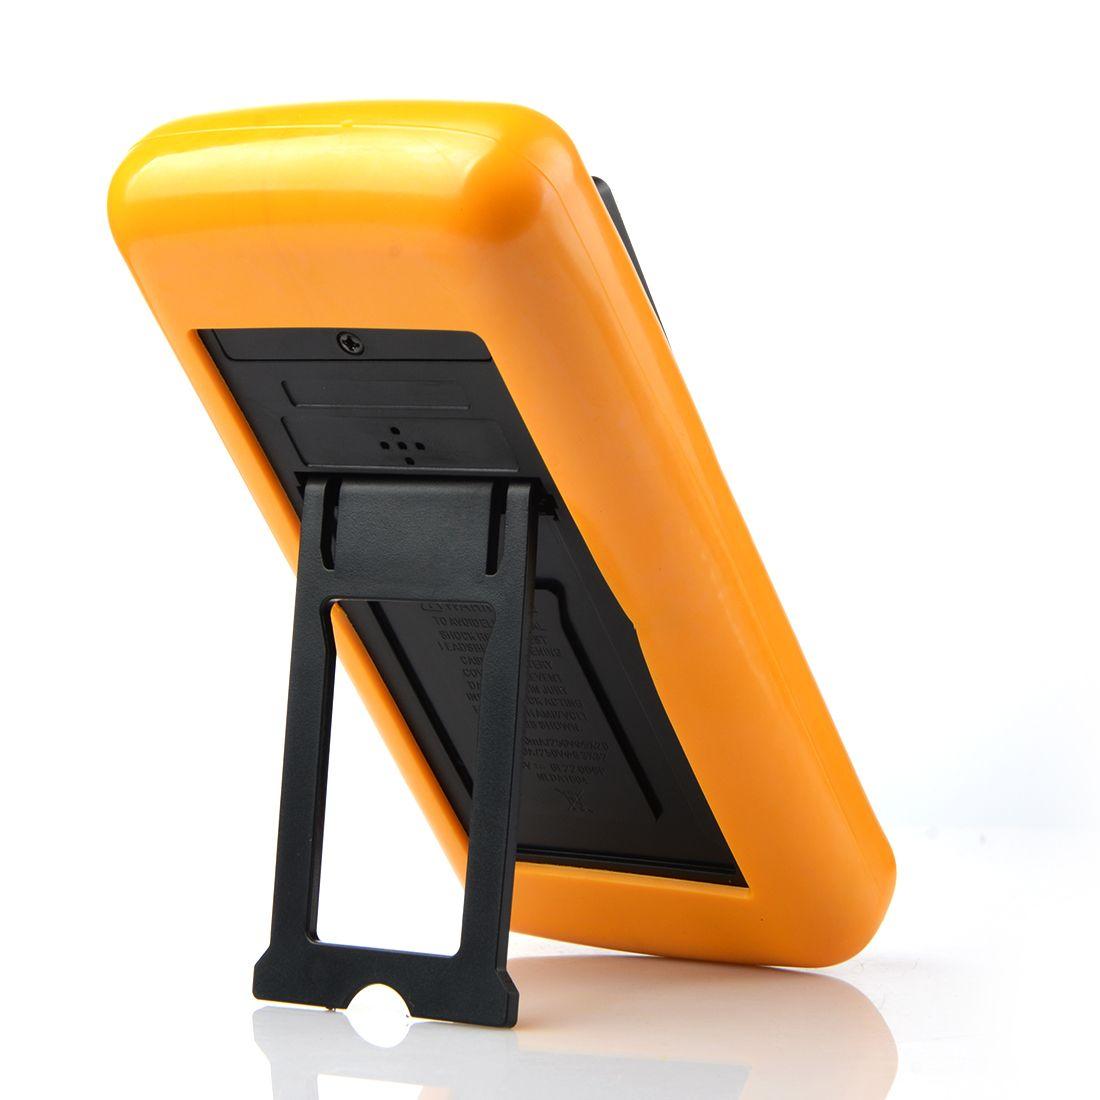 AC DC LCD Ekran Dijital Multimetre Profesyonel Elektrikli El Tester Metre Multimetro Ampermetre Voltmetre Multitester EXCEL DT9205A